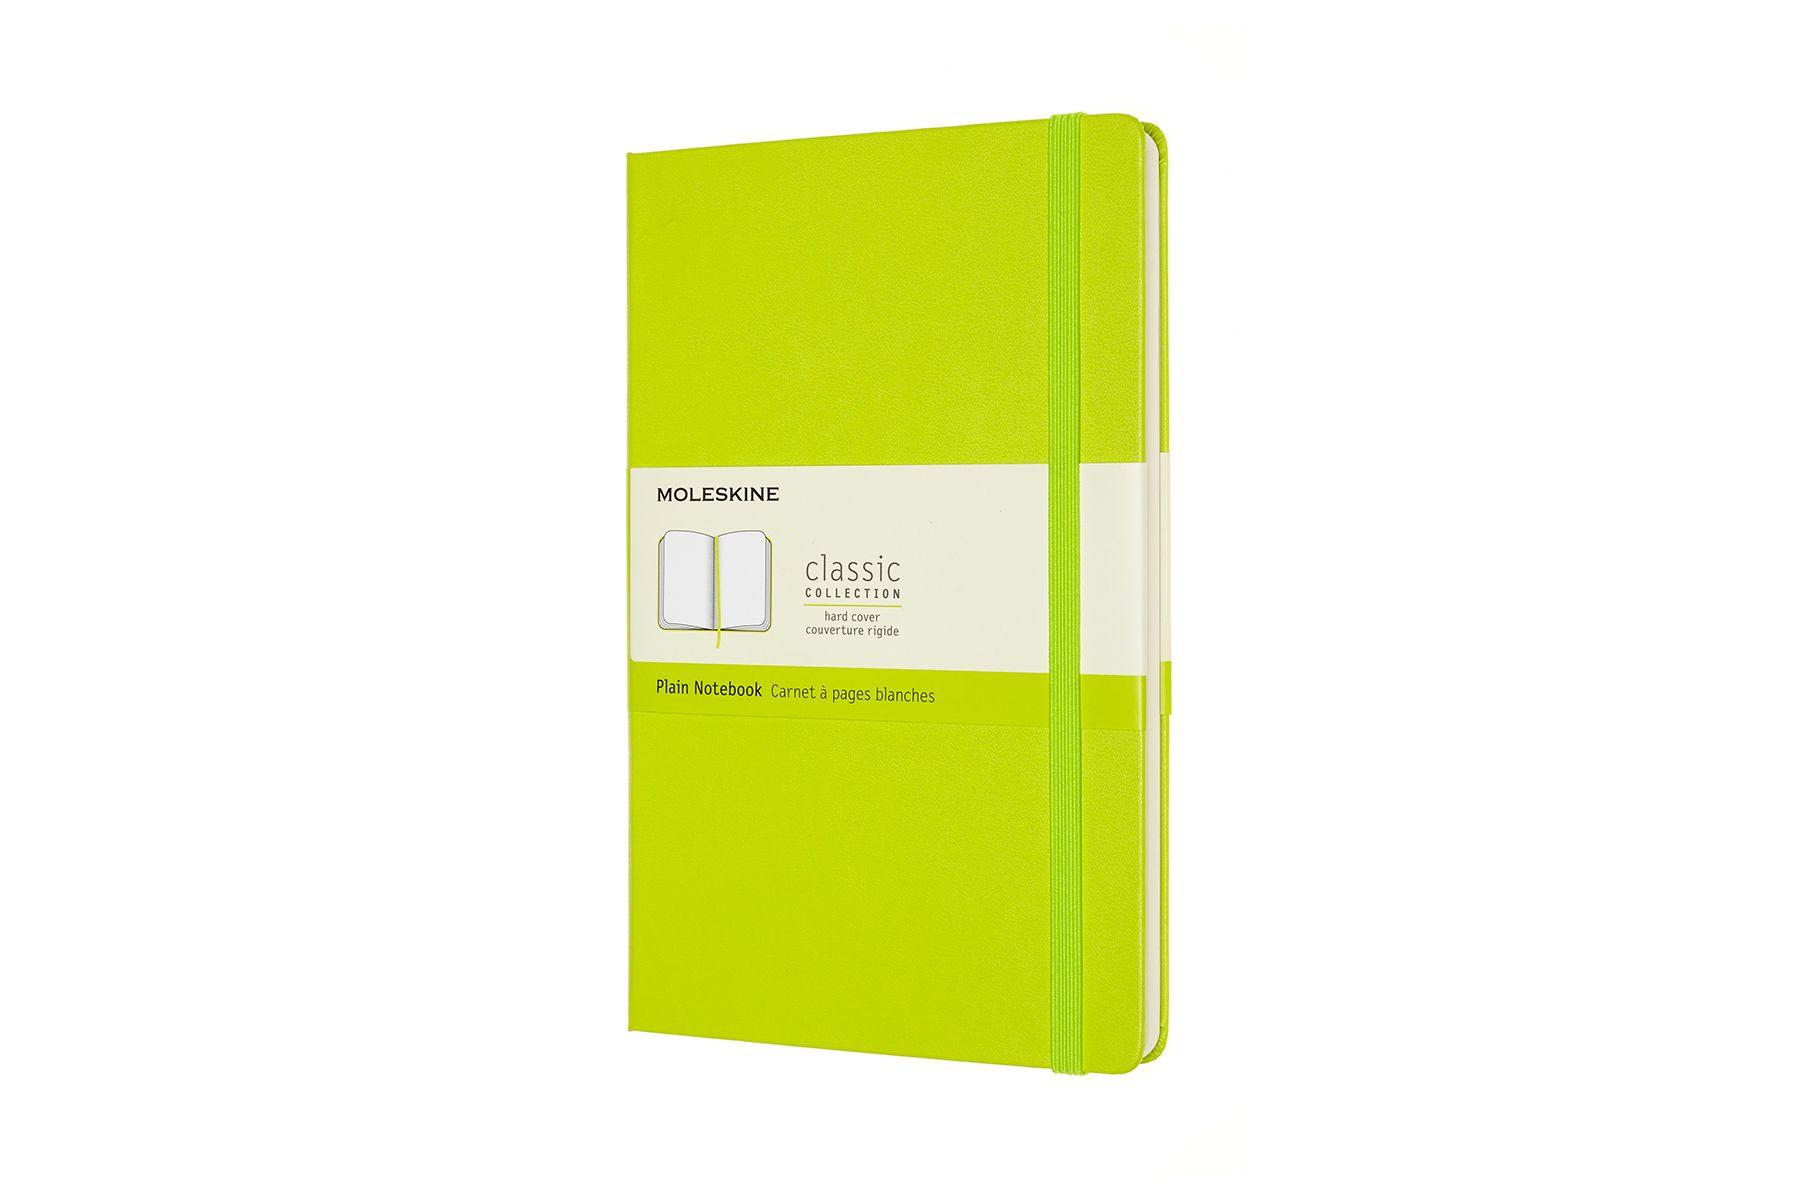 Blanco notitieboek Moleskine lime green